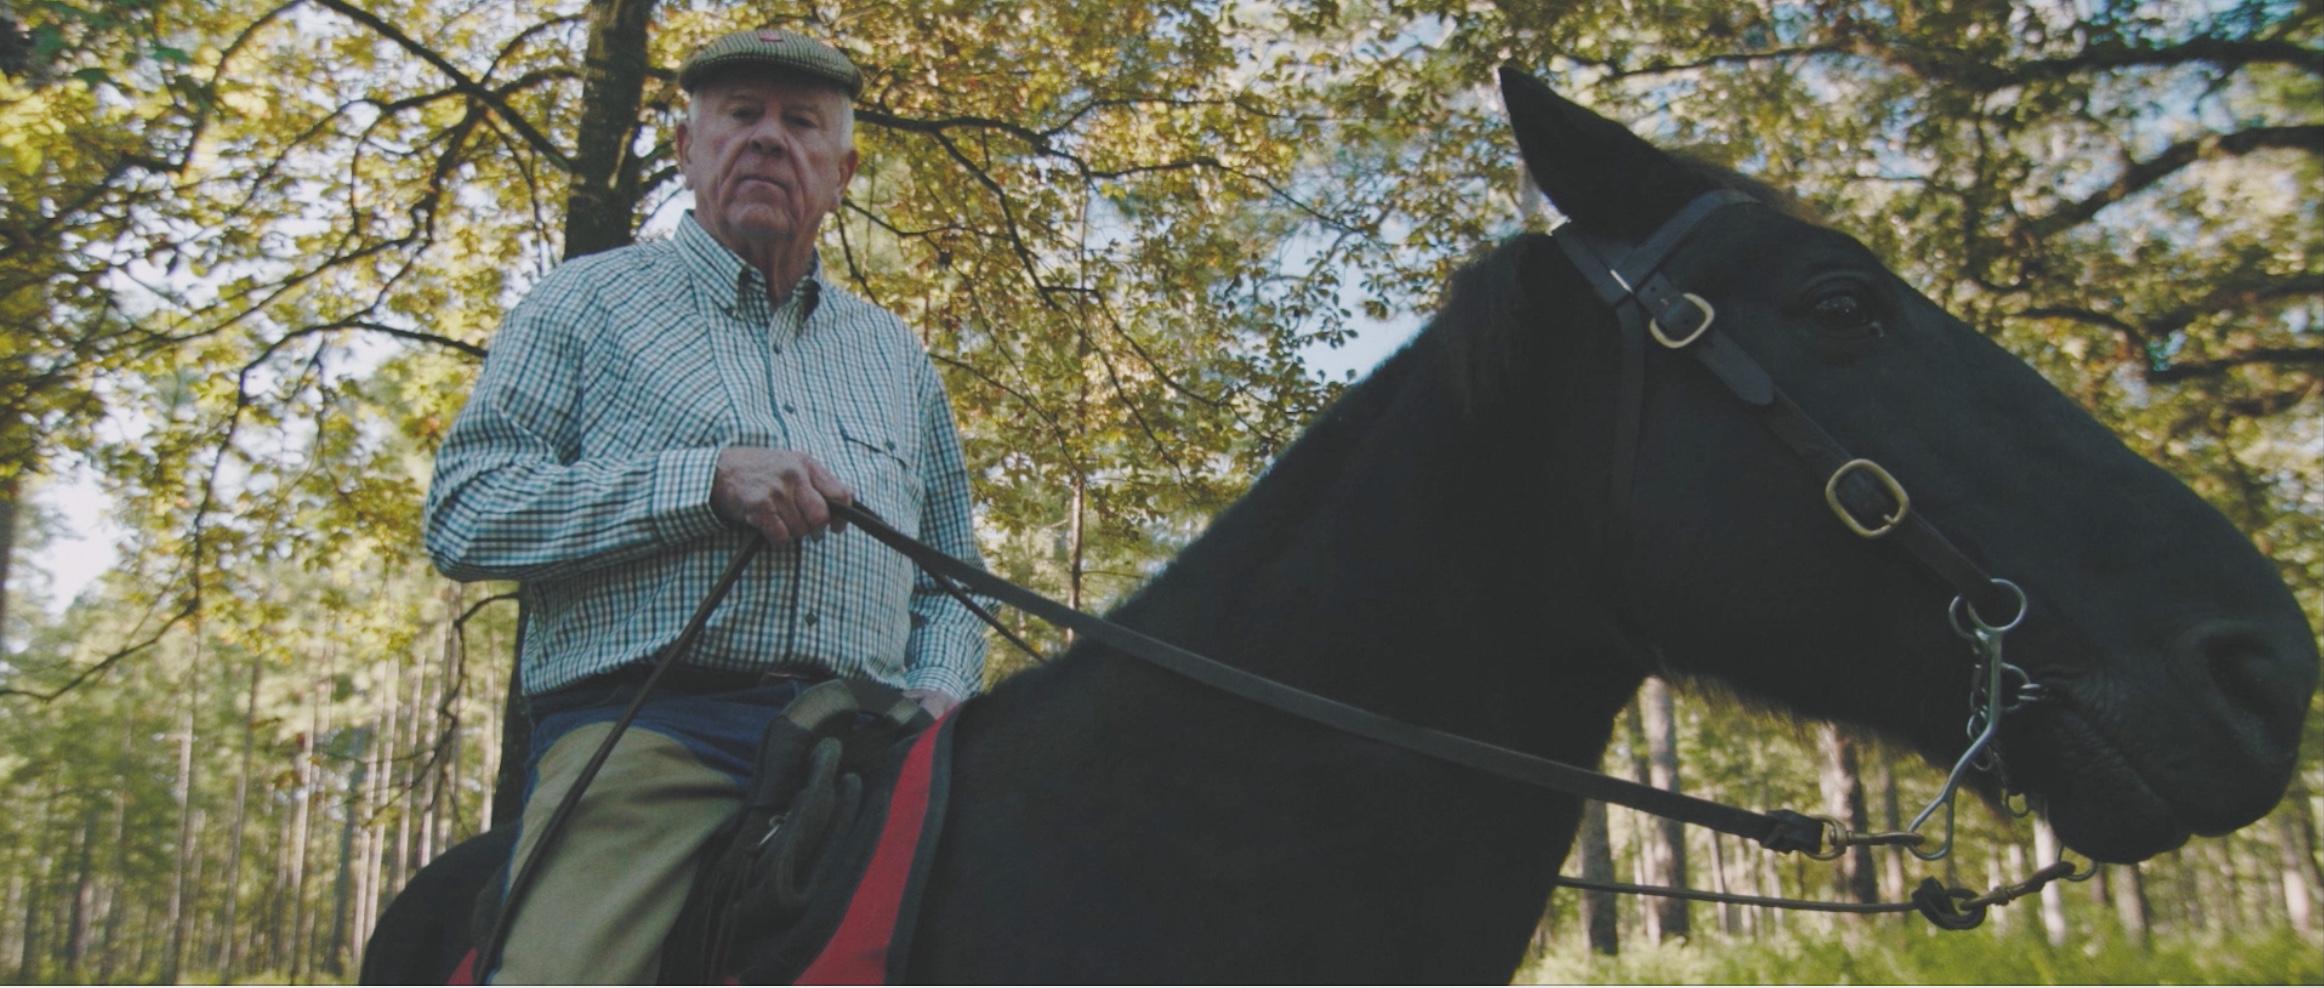 Older Gentleman on Horseback